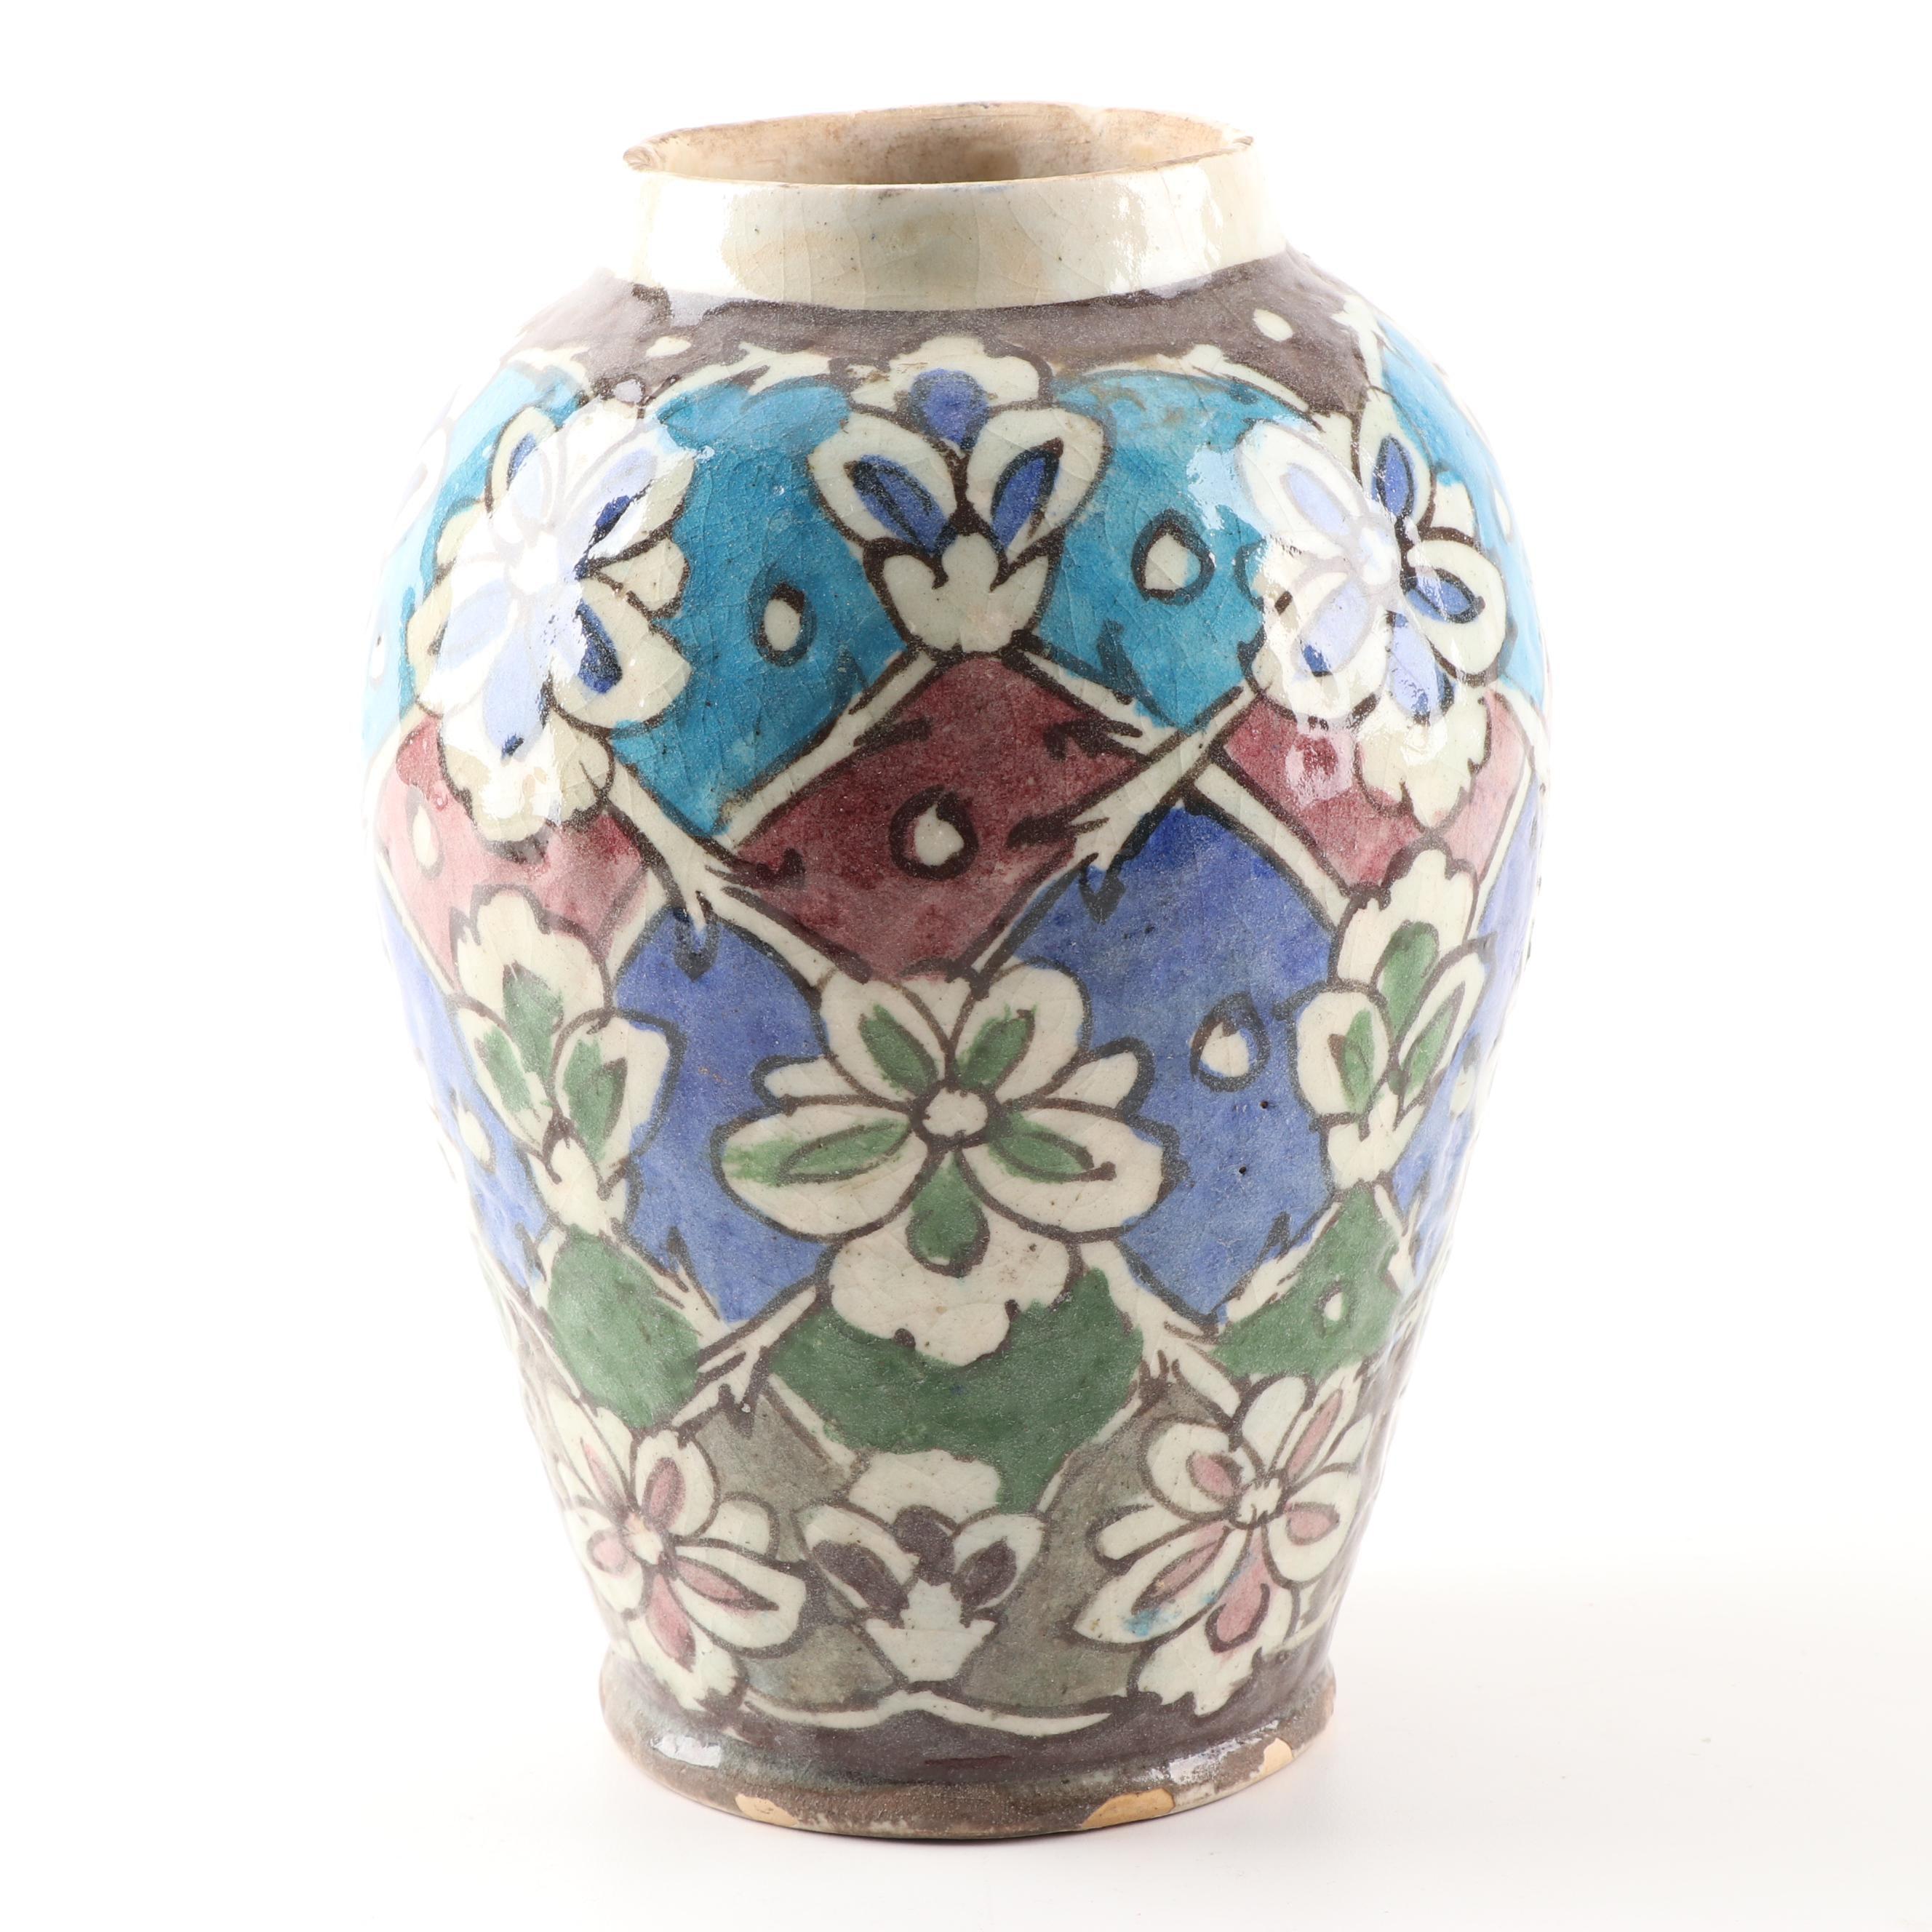 Hand-Painted Turkish Style Earthenware Vase